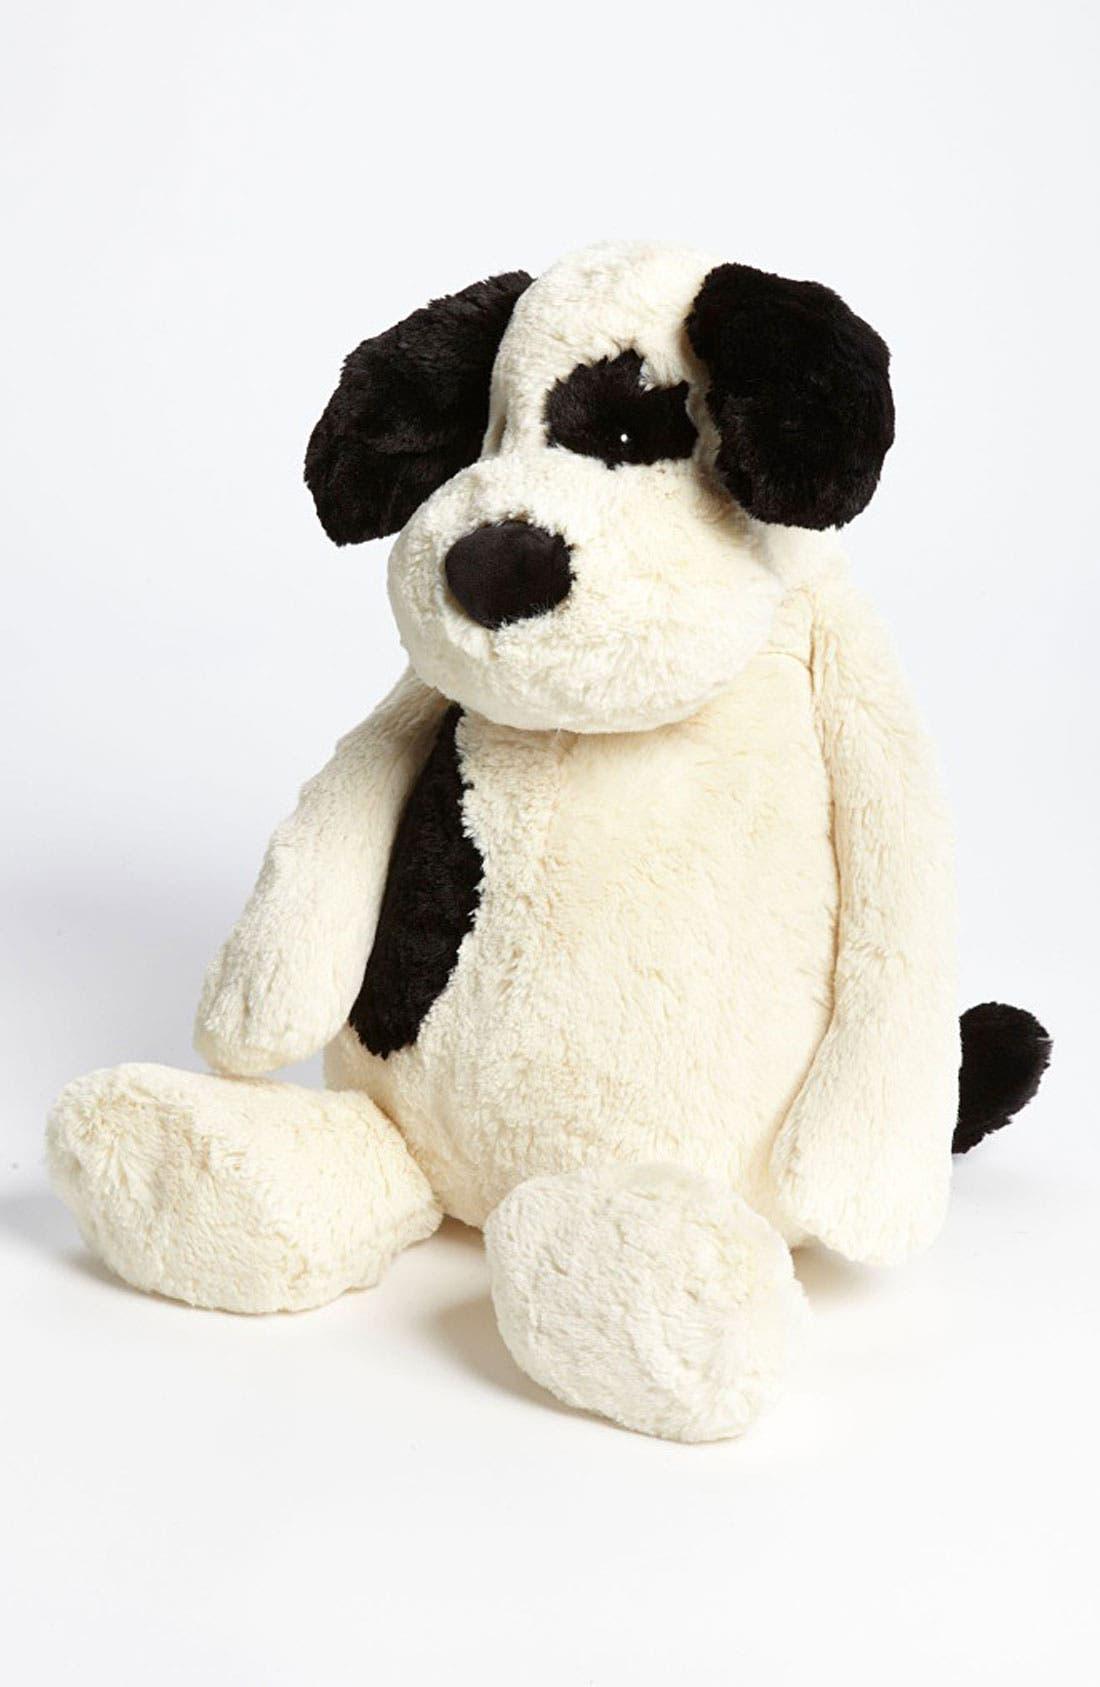 Alternate Image 1 Selected - Jellycat 'Large Bashful Puppy' Stuffed Animal